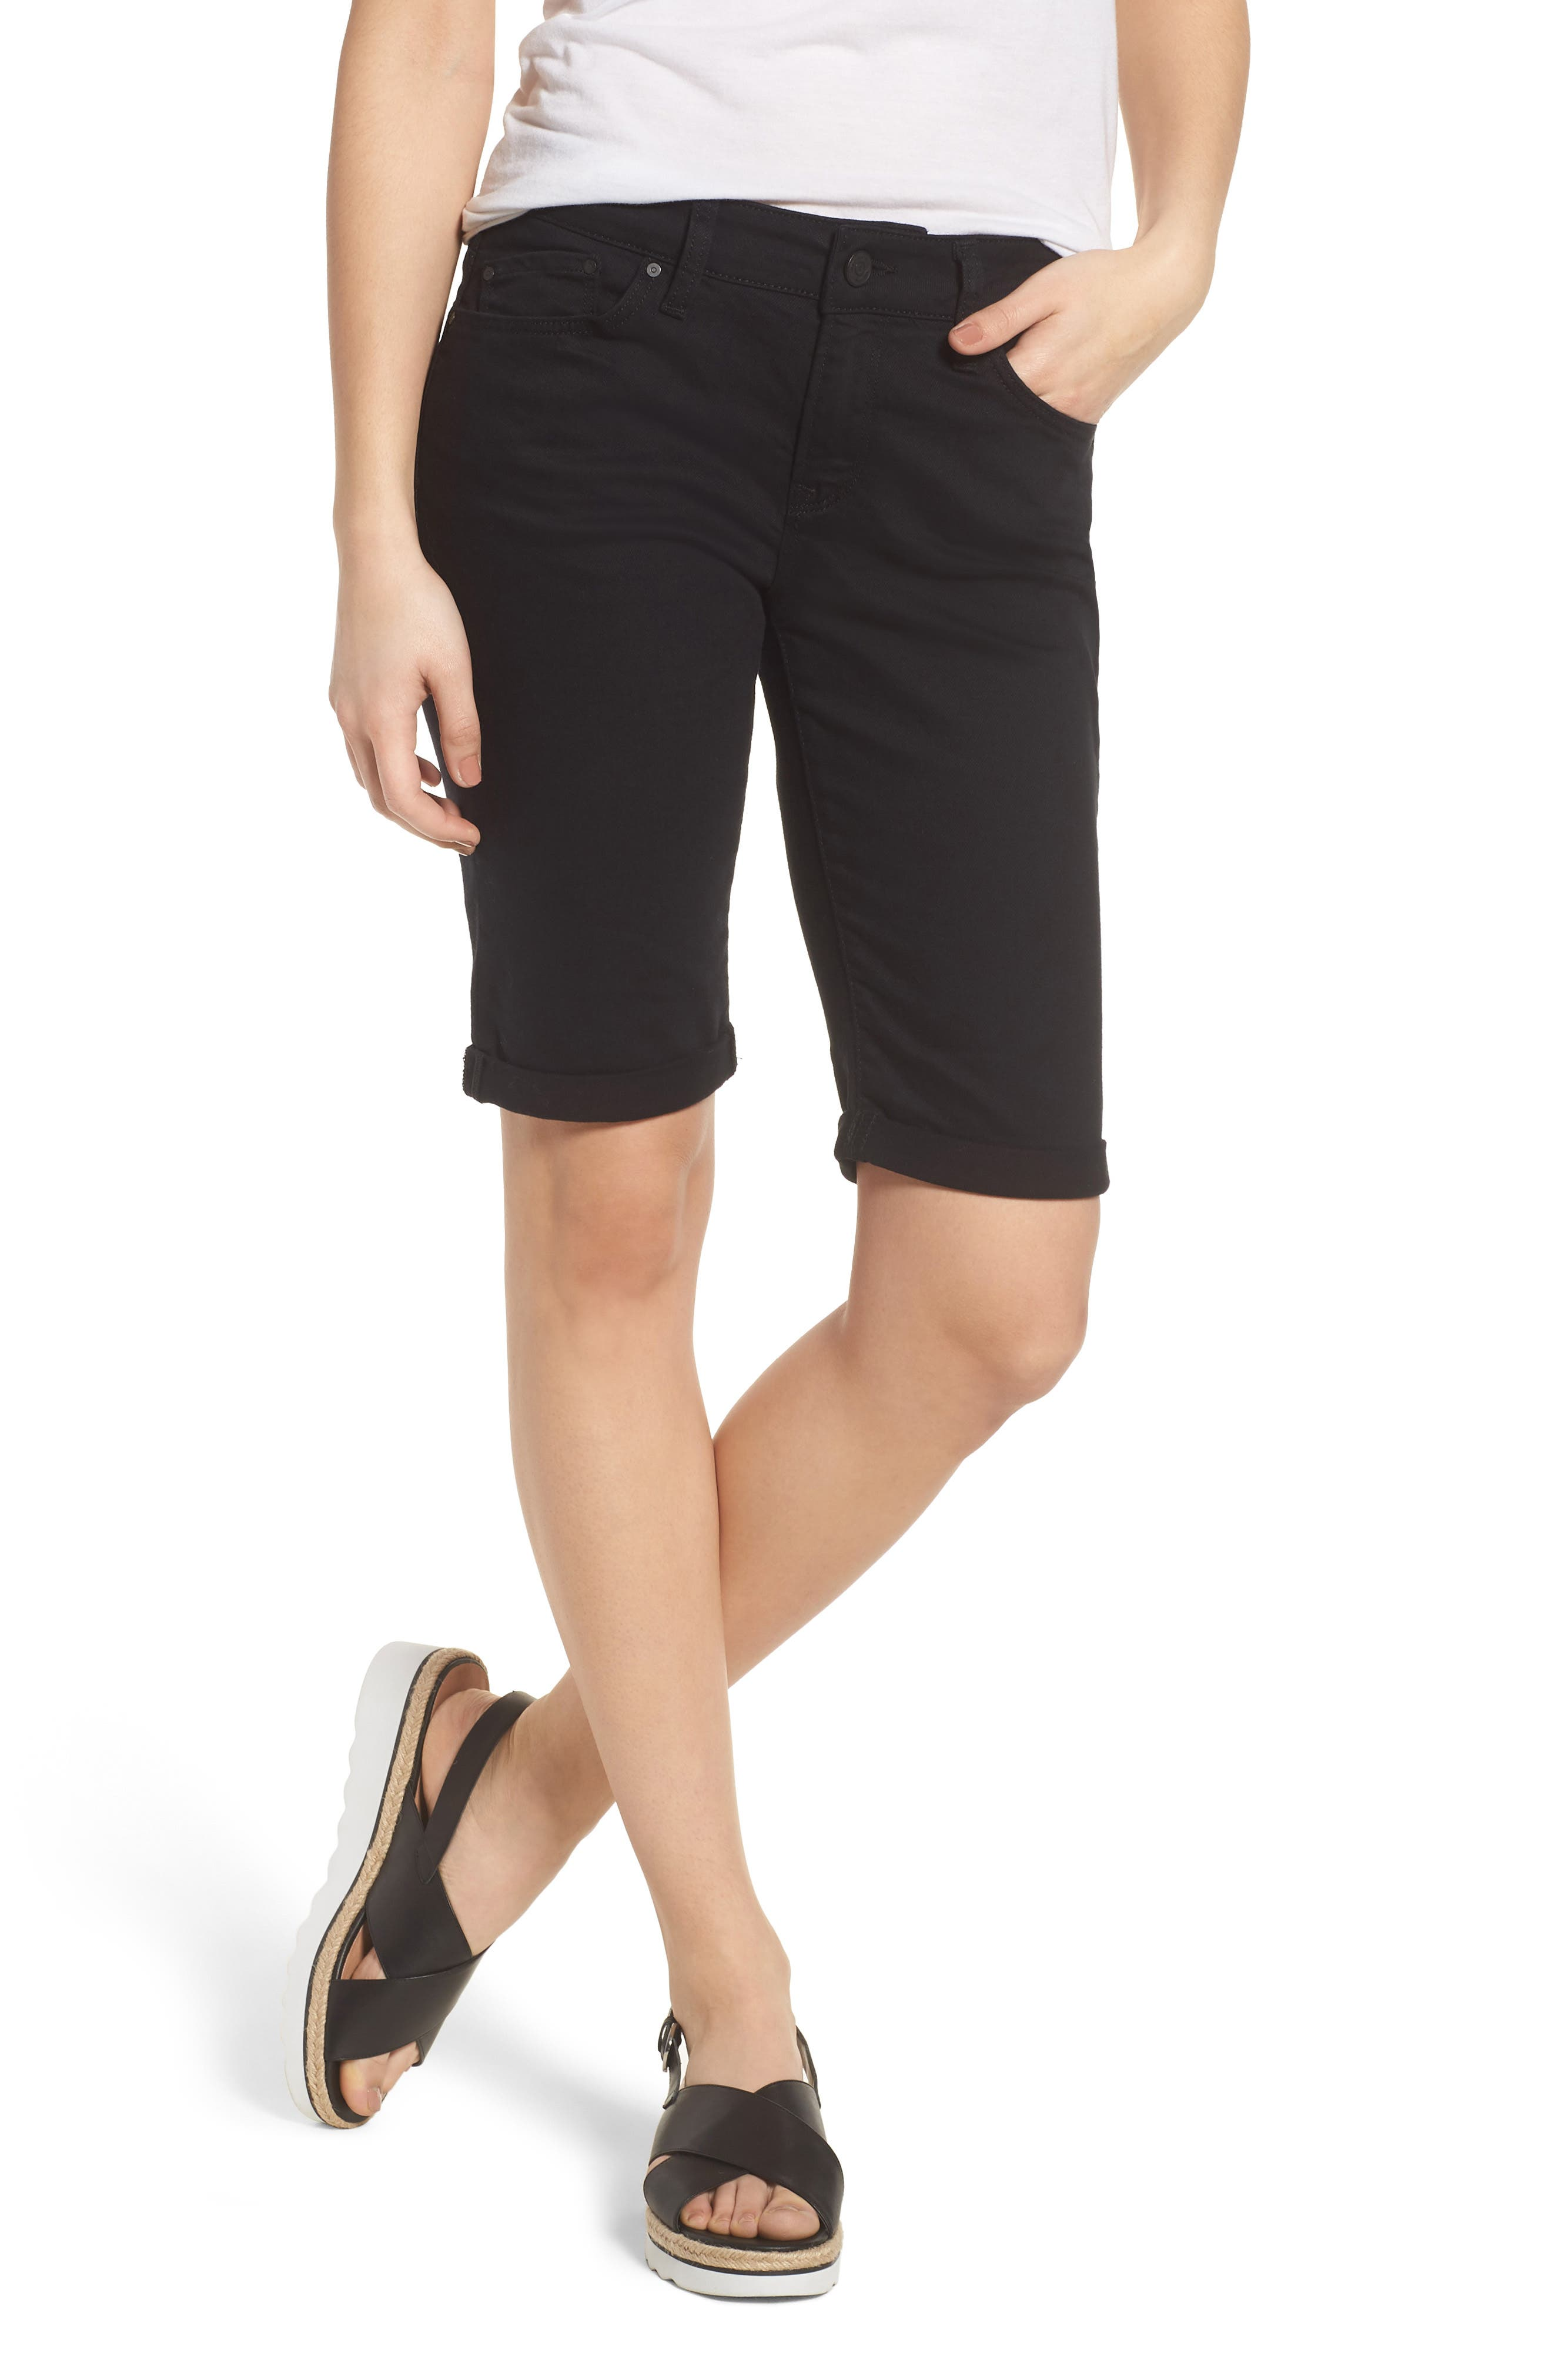 Karly Black Nolita Roll Cuff Bermuda Shorts,                         Main,                         color, 001